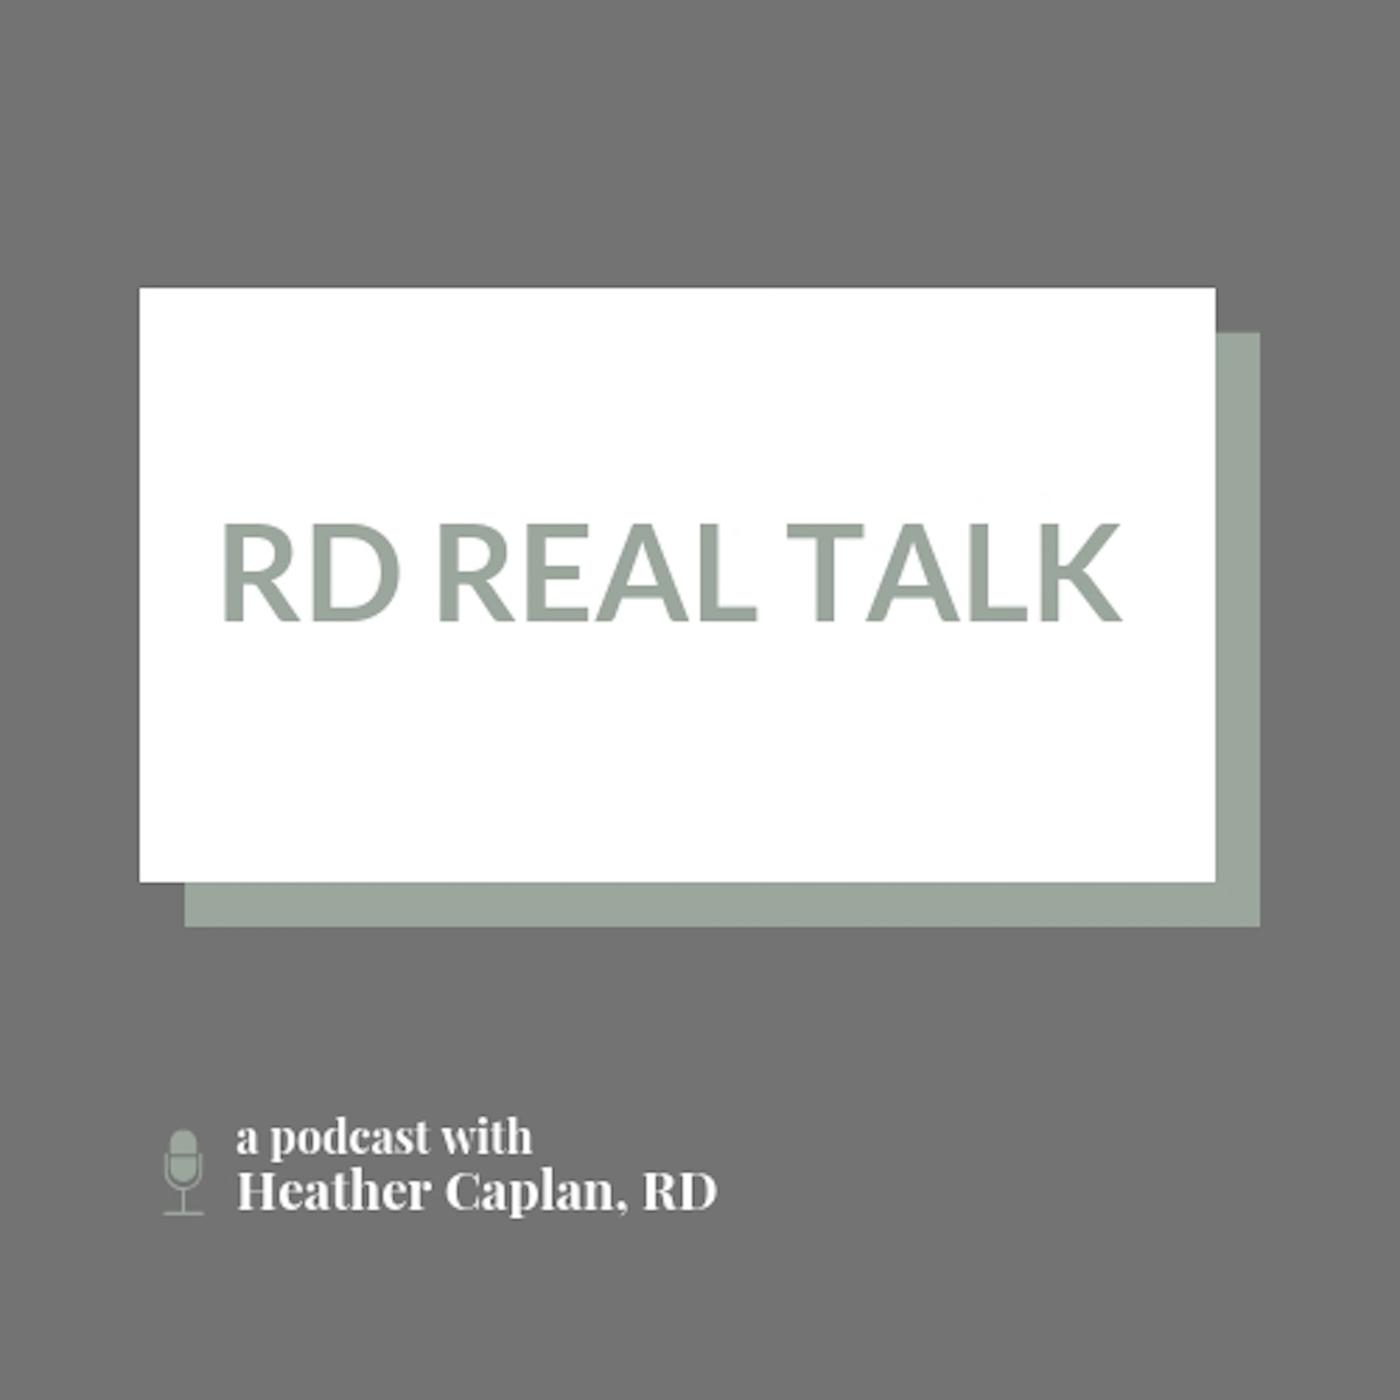 RD Real Talk logo